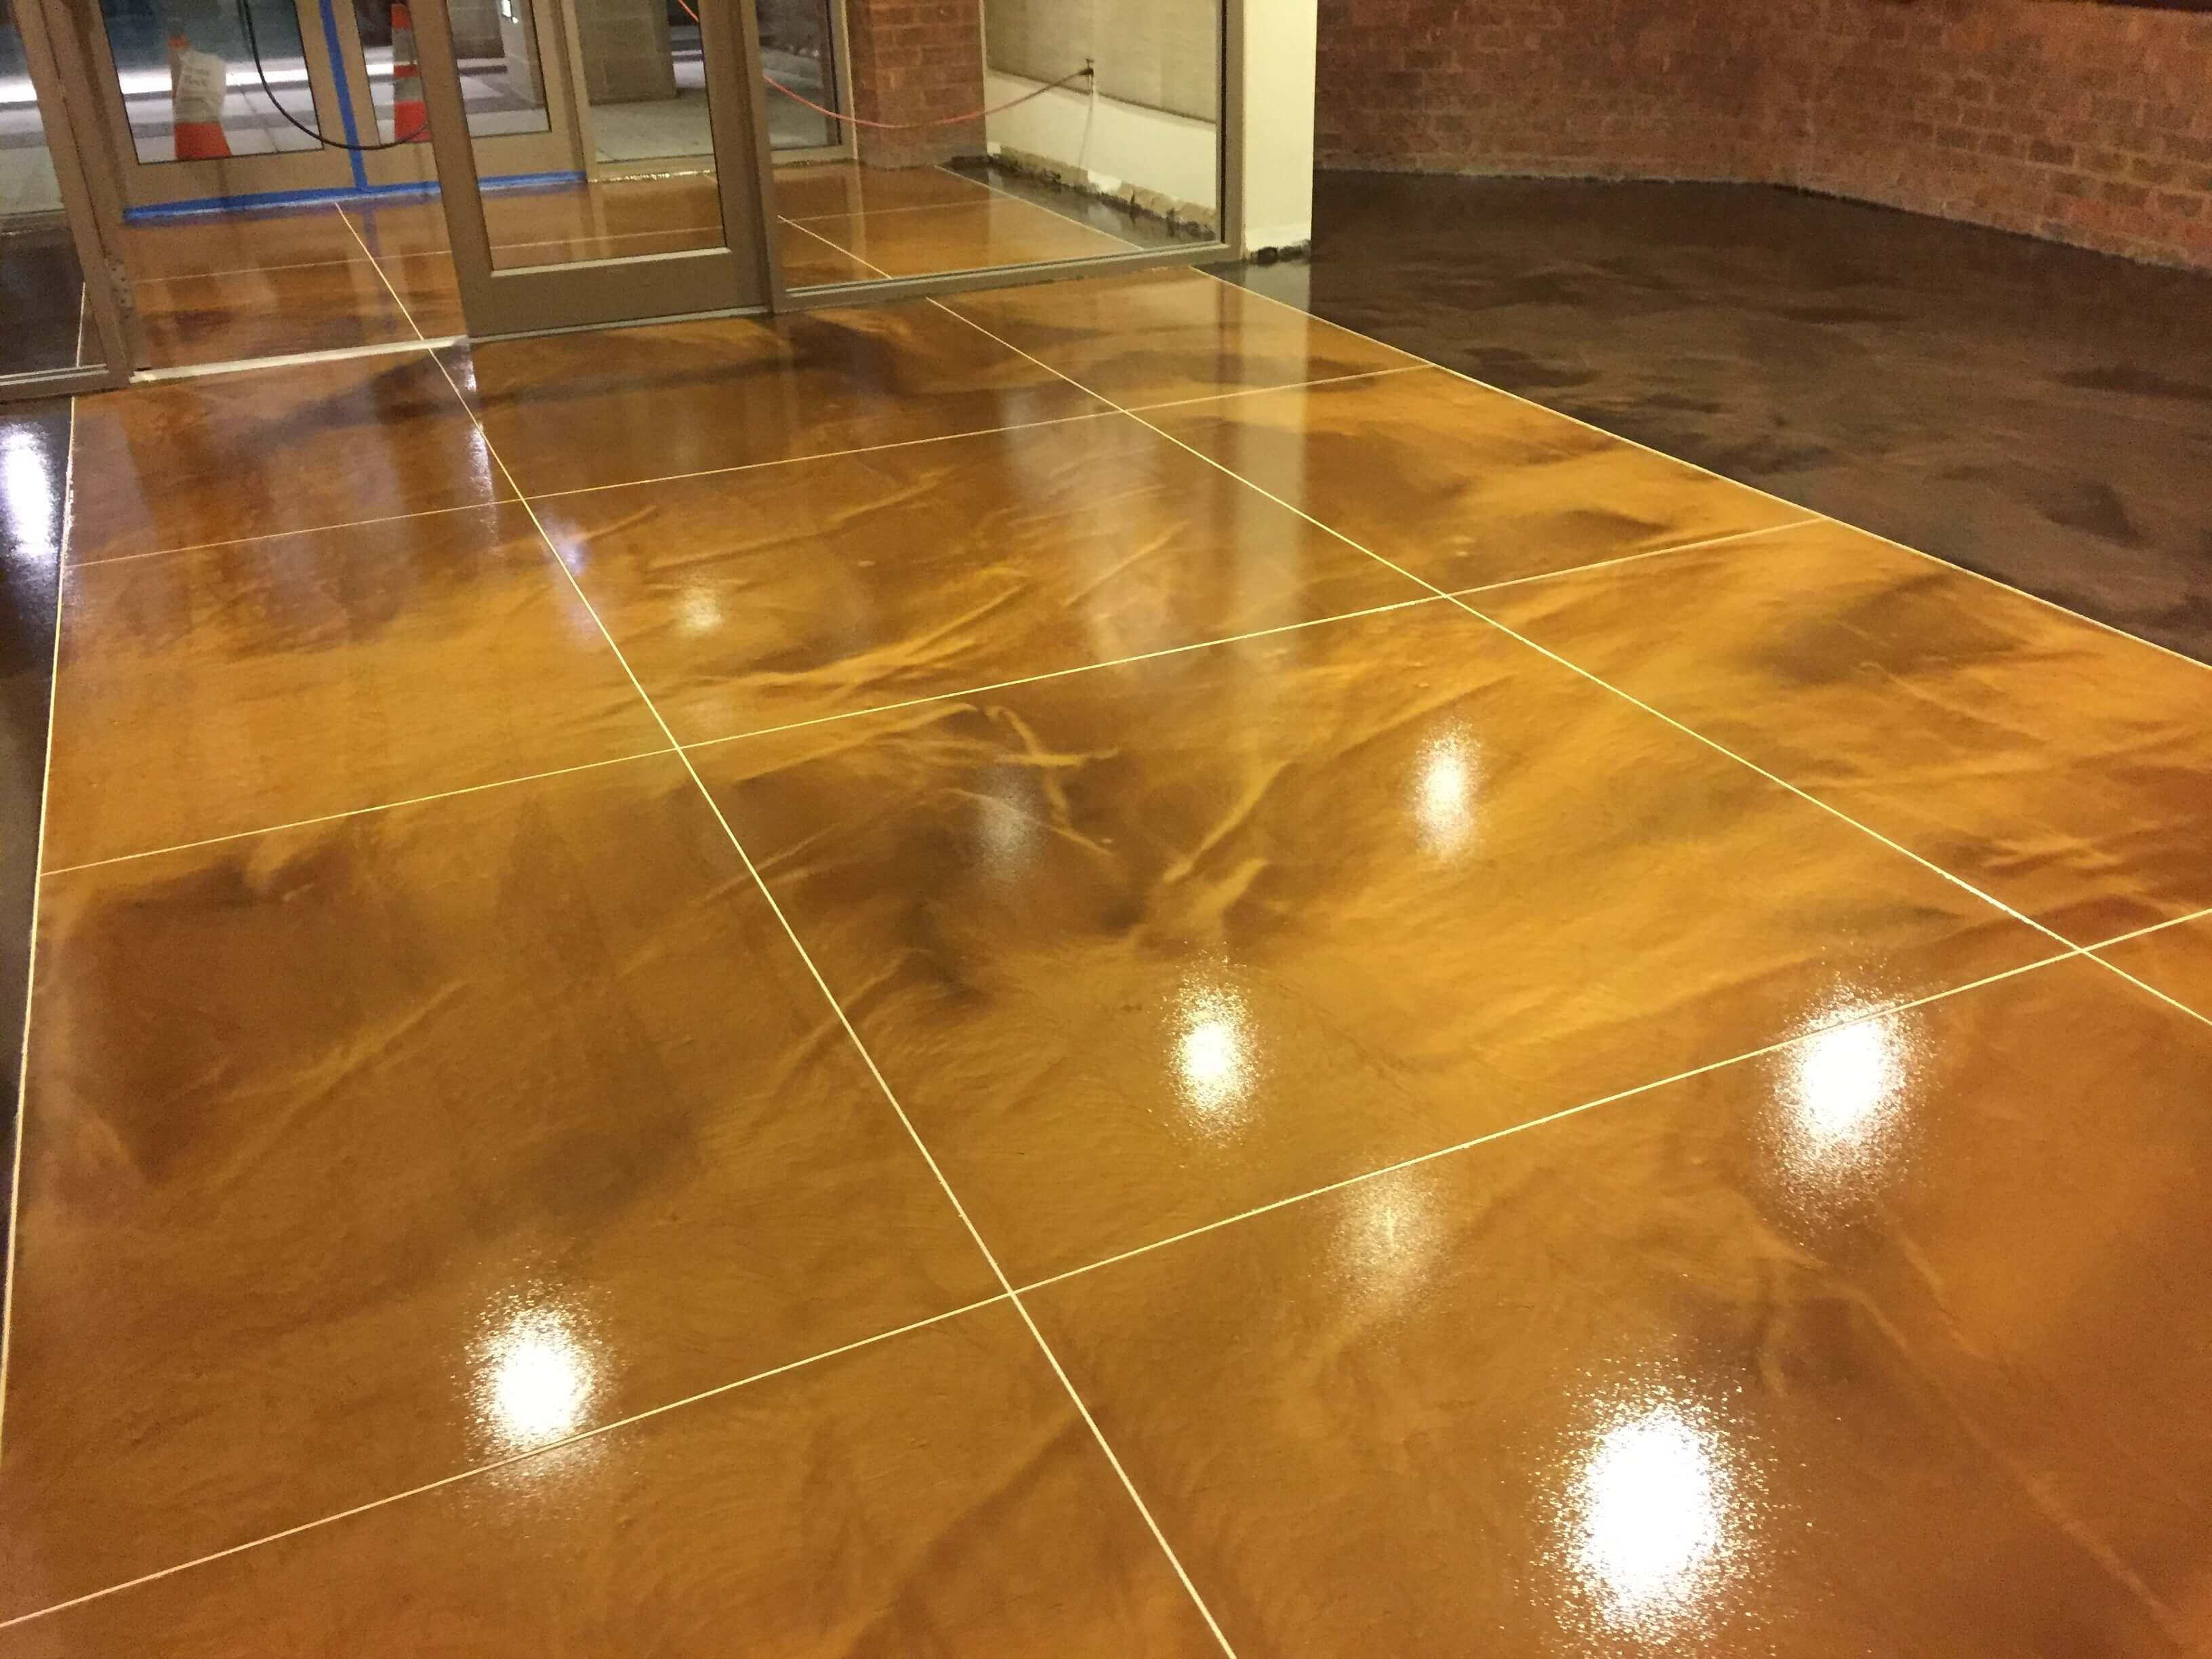 Maryland Concrete Design | Epoxy Floor Coatings